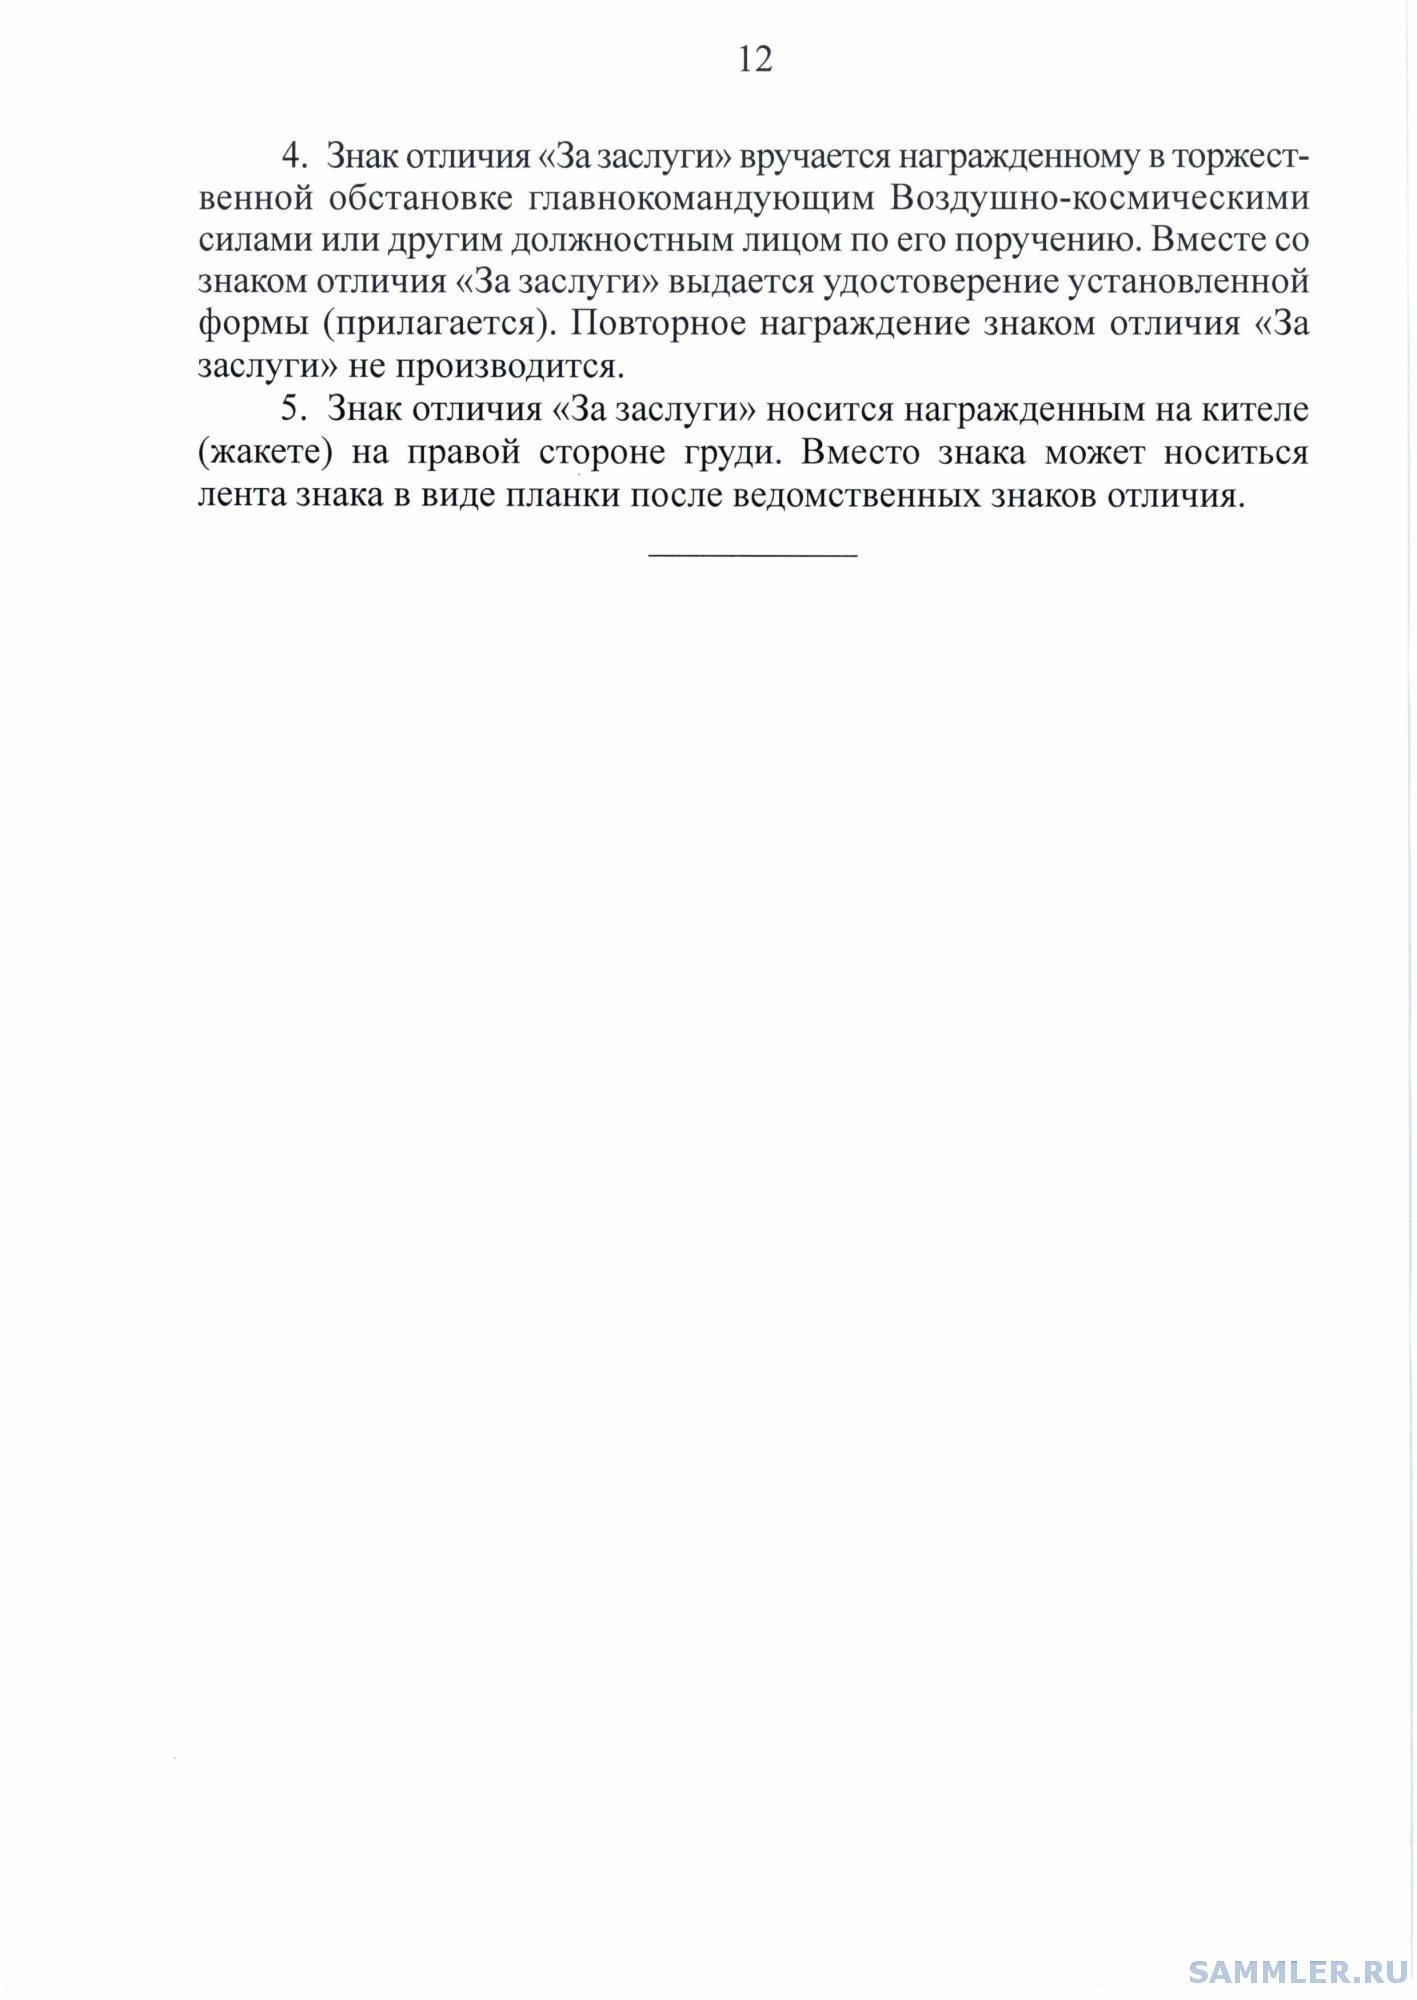 МО РФ 470(цвет)-12.jpg